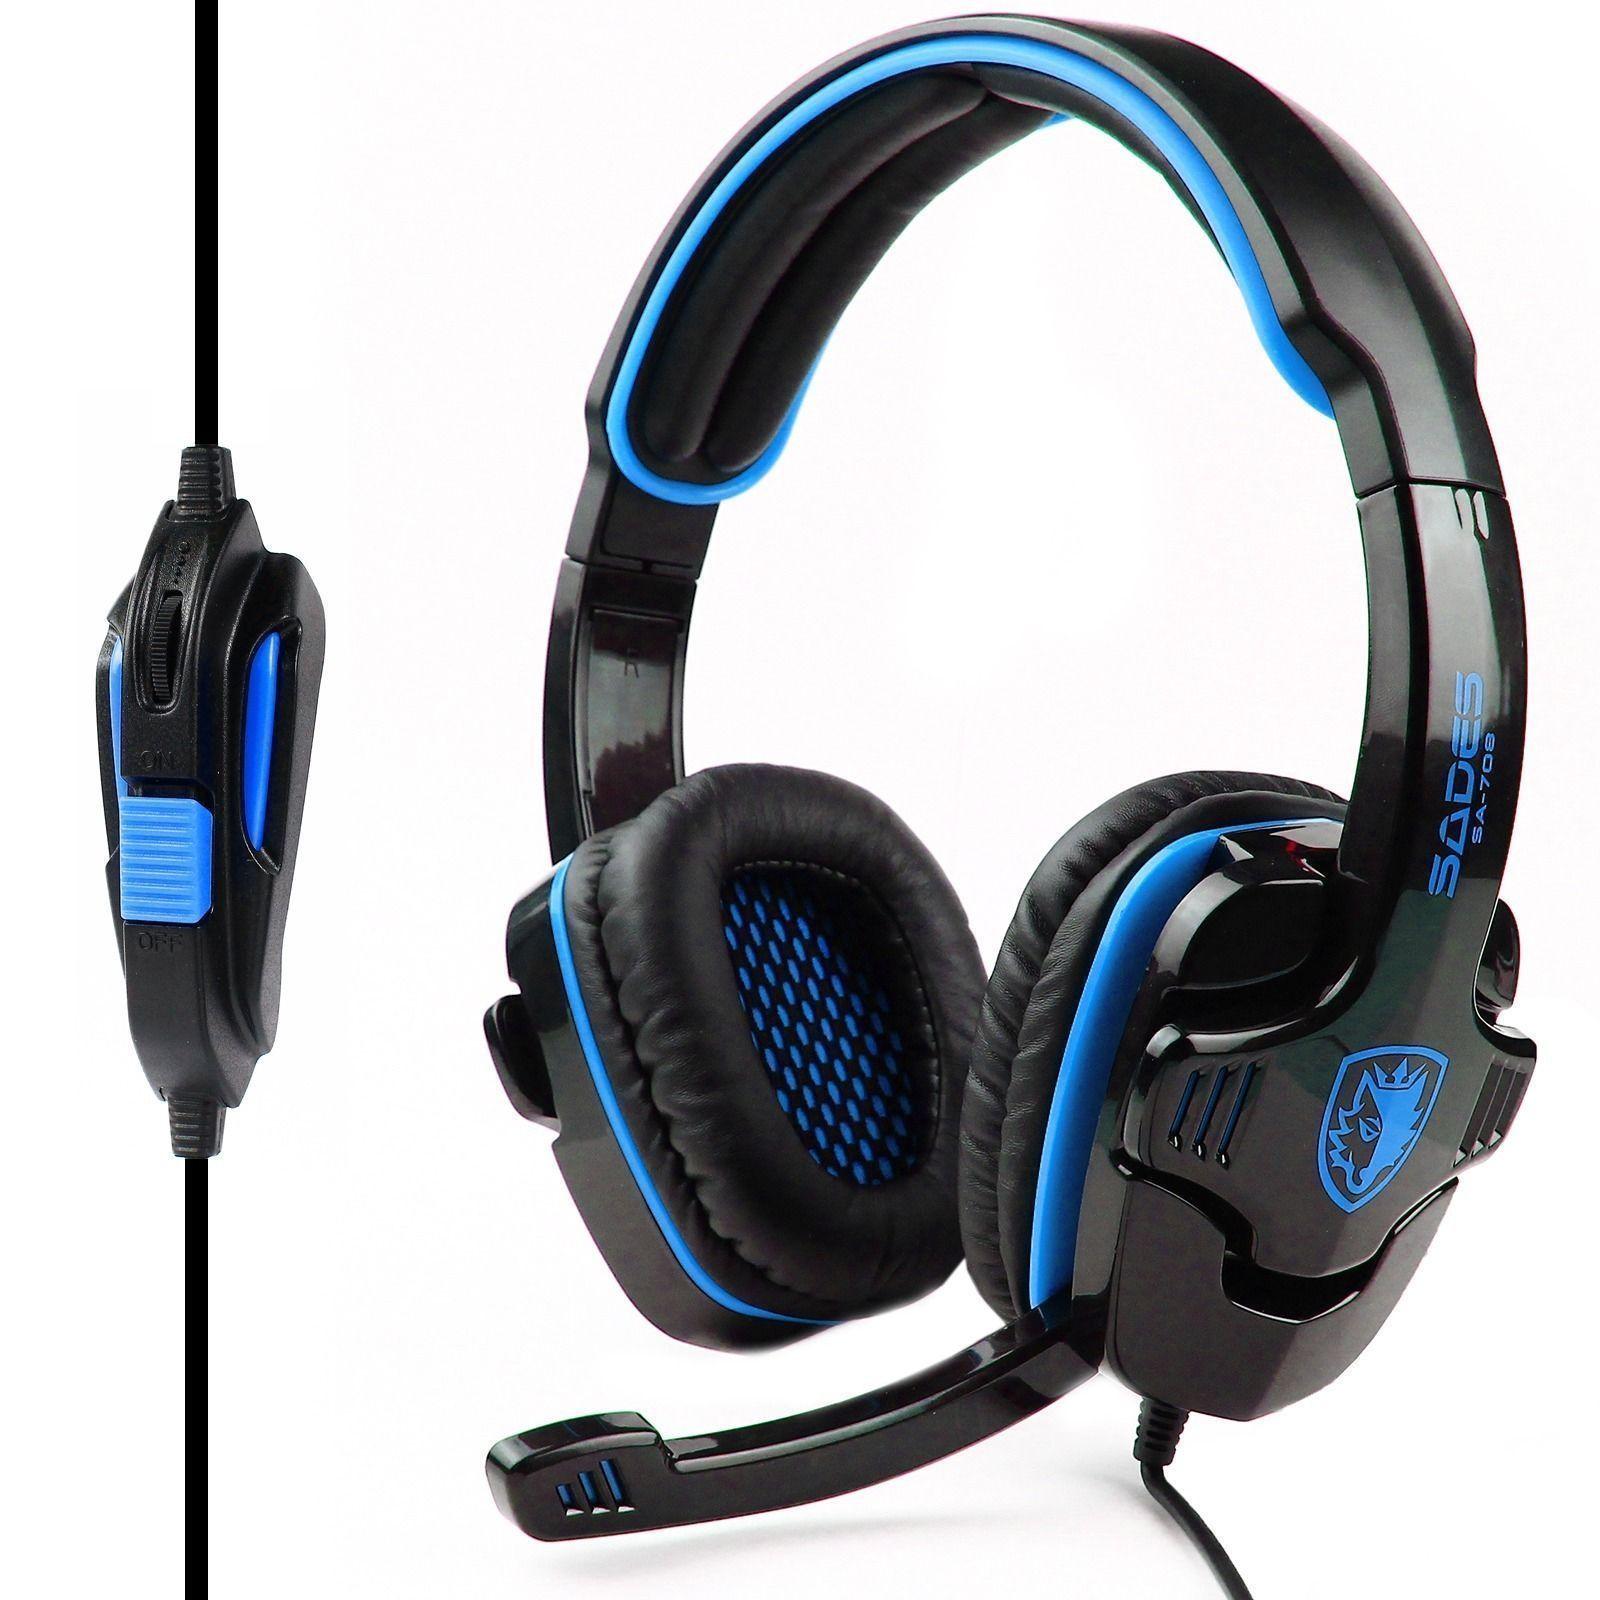 HiFi Stereo Bass Headset Headband 3.5mm PC Notebook Pro Gaming with Mic